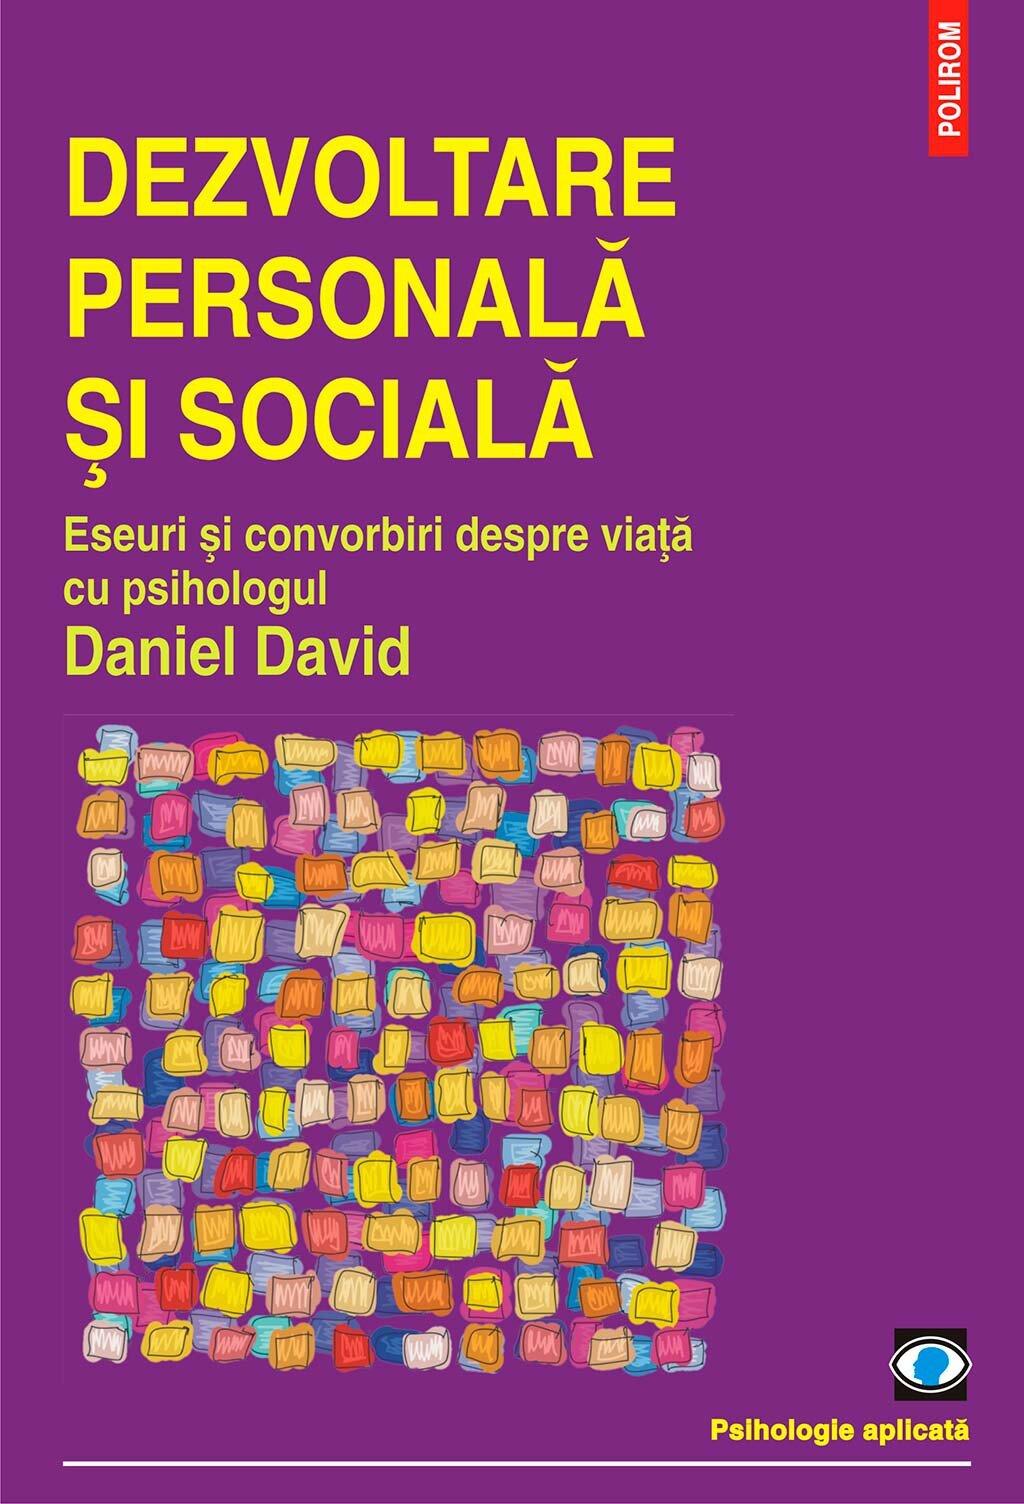 Dezvoltare personala si sociala. Eseuri si convorbiri despre viata cu psihologul Daniel David (eBook)